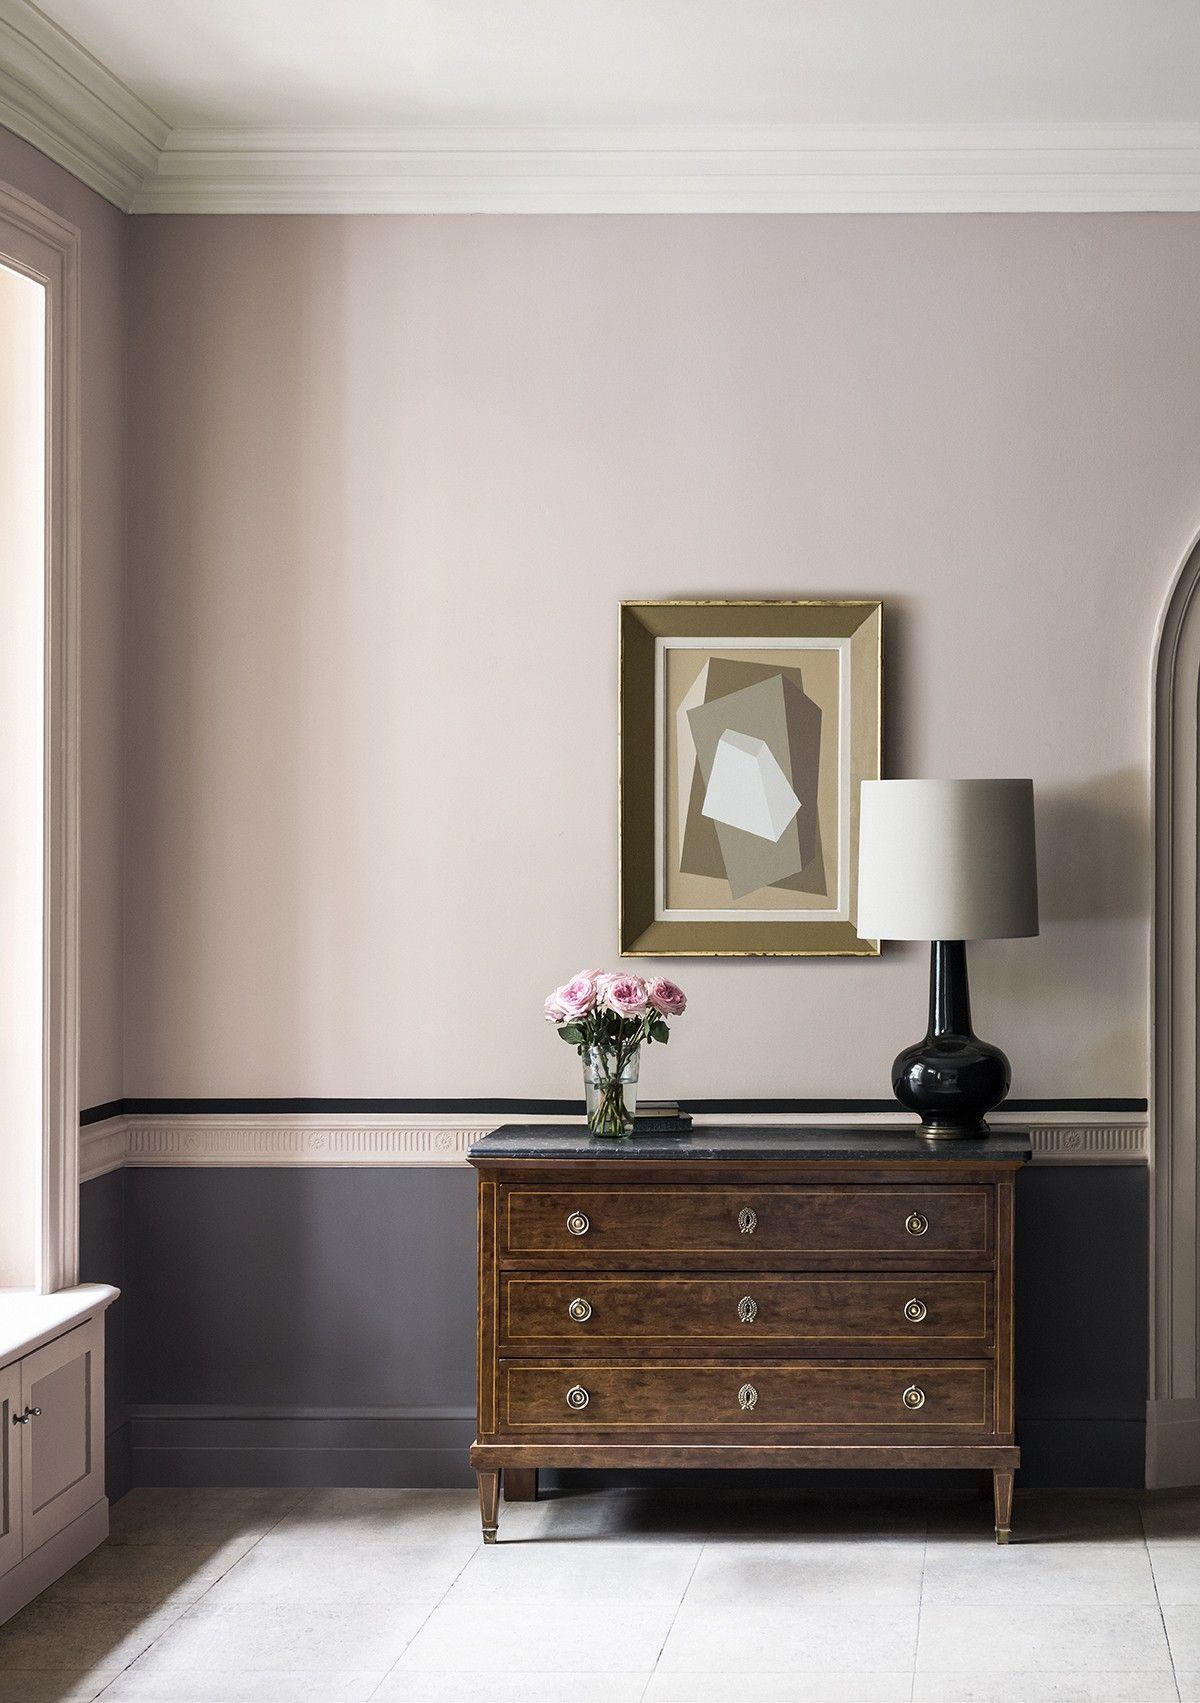 Temple Hallway. Pink and dark grey. | c o l o r s in 2018 ...